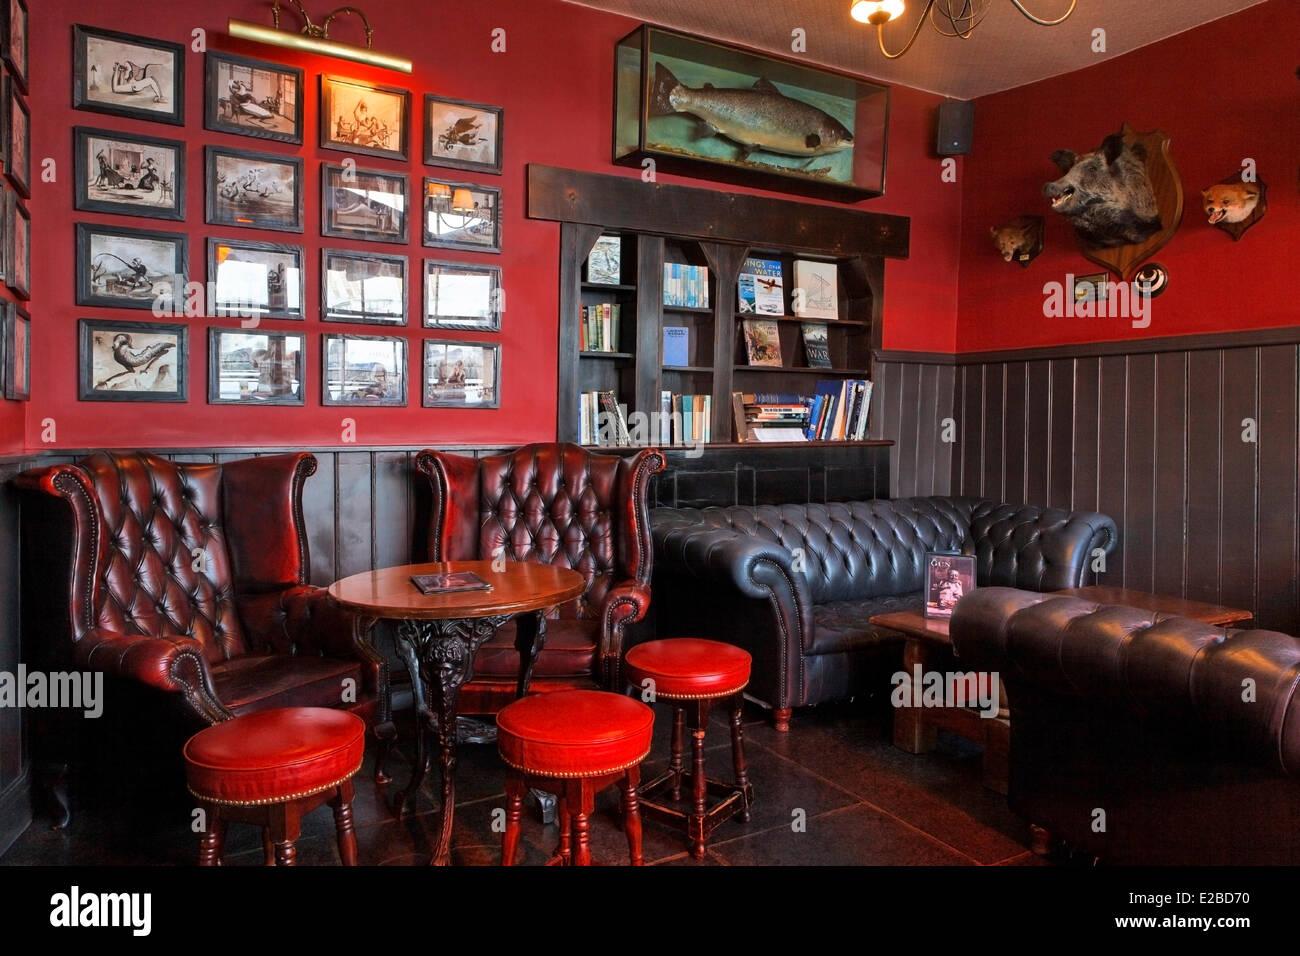 United Kingdom, London, the Isle of Dogs, the Gun restaurant - Stock Image